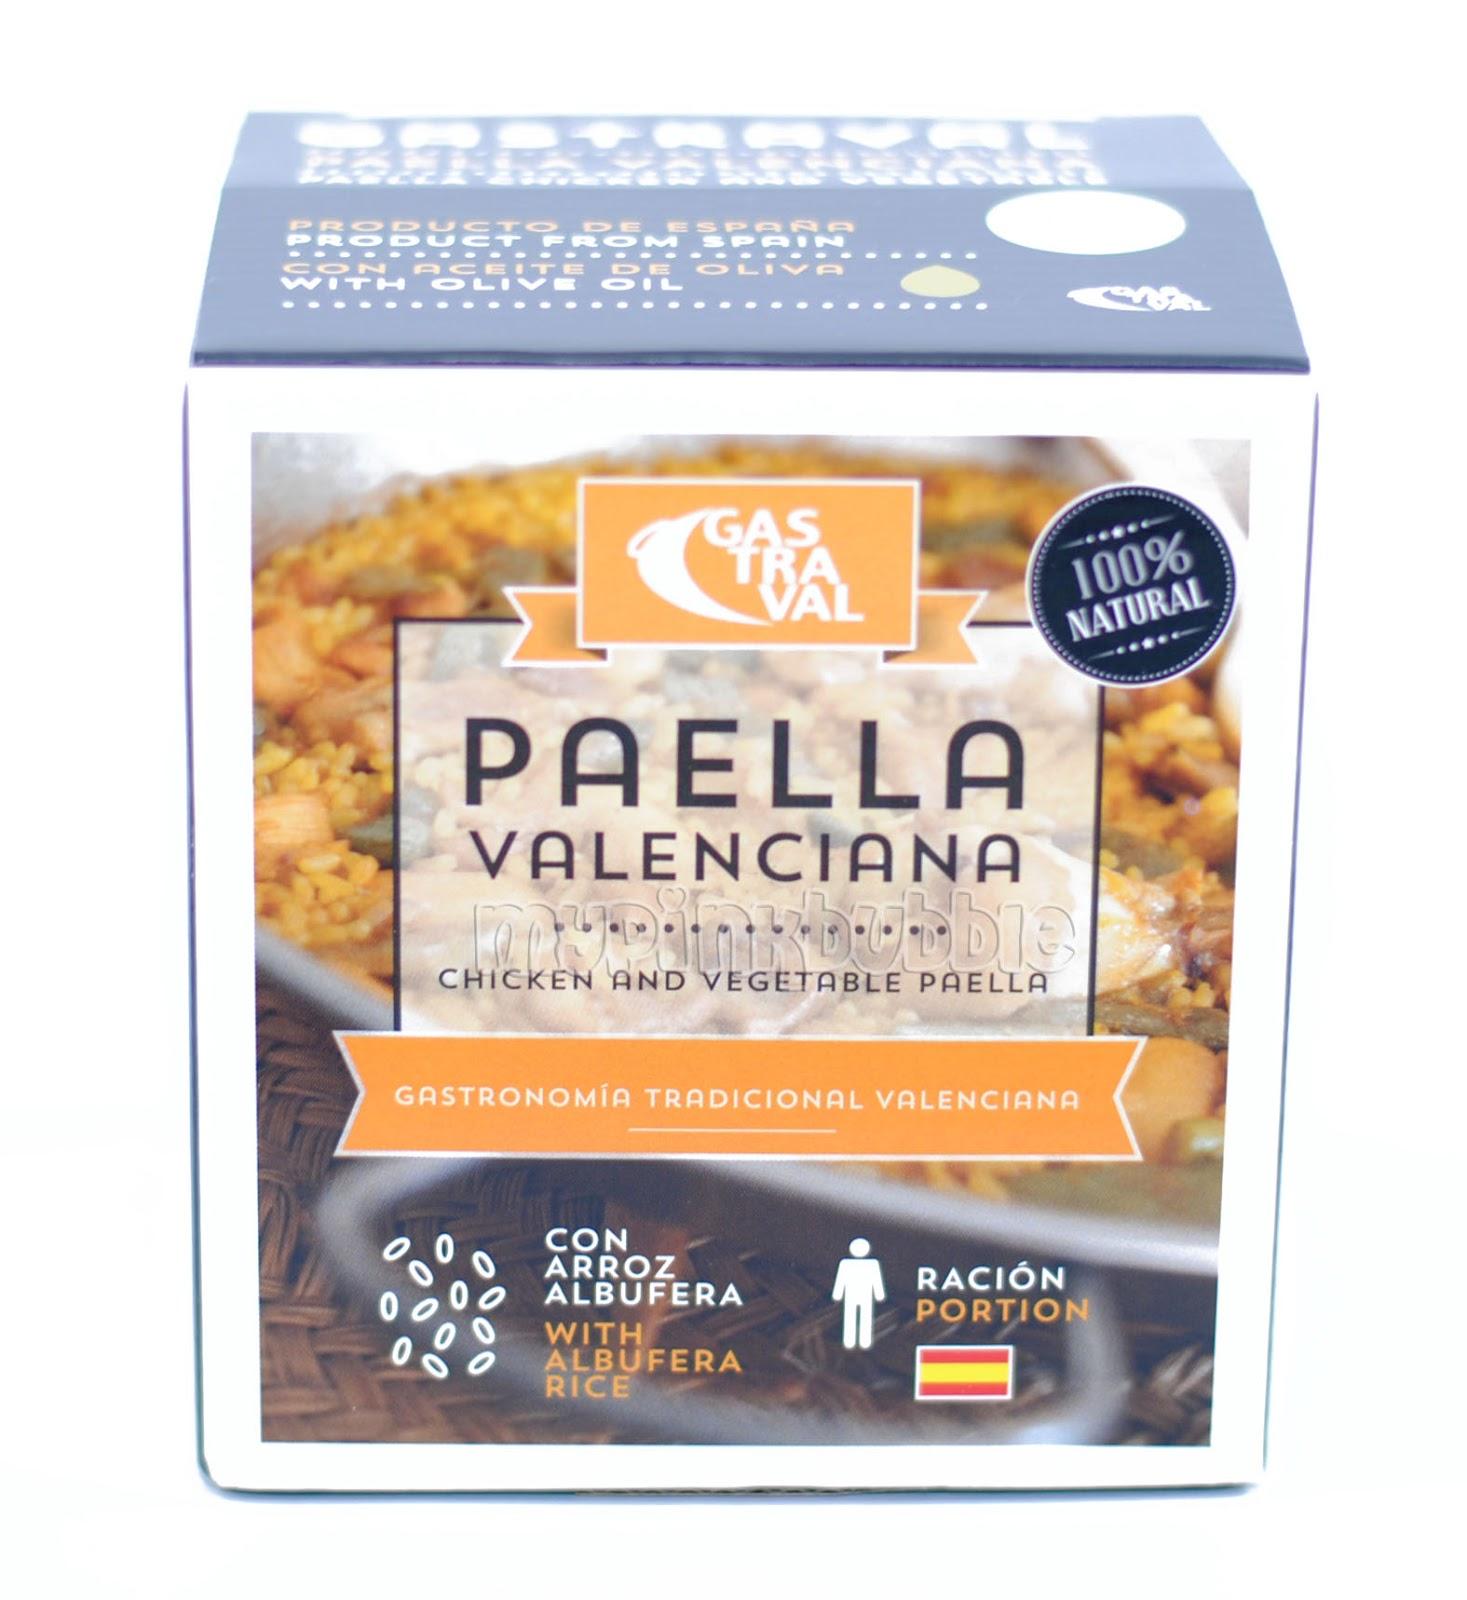 Gastraval paella valenciana